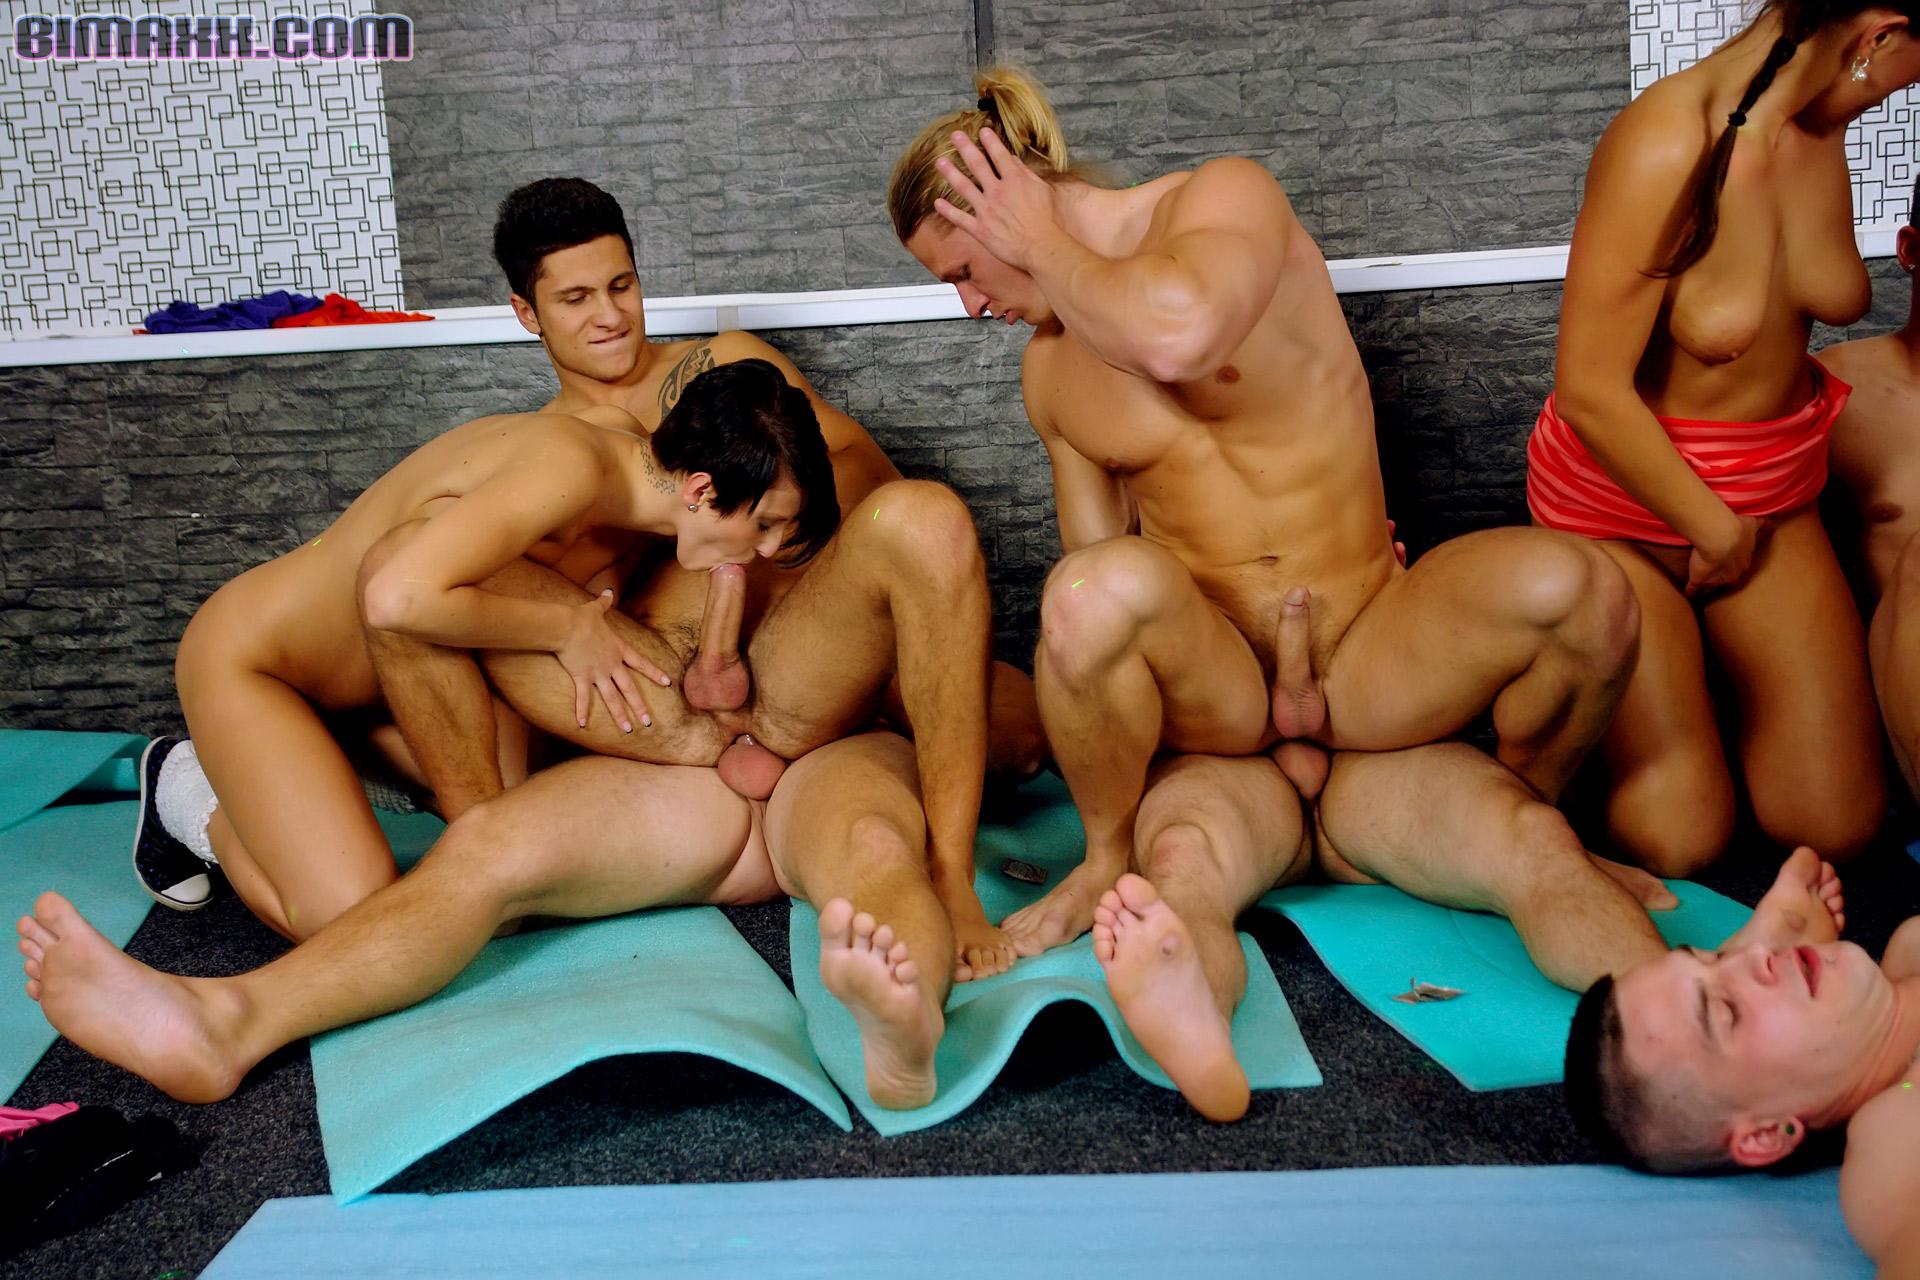 Фото галерея бисексуал, Классное порно фото бисексуалов 6 фотография